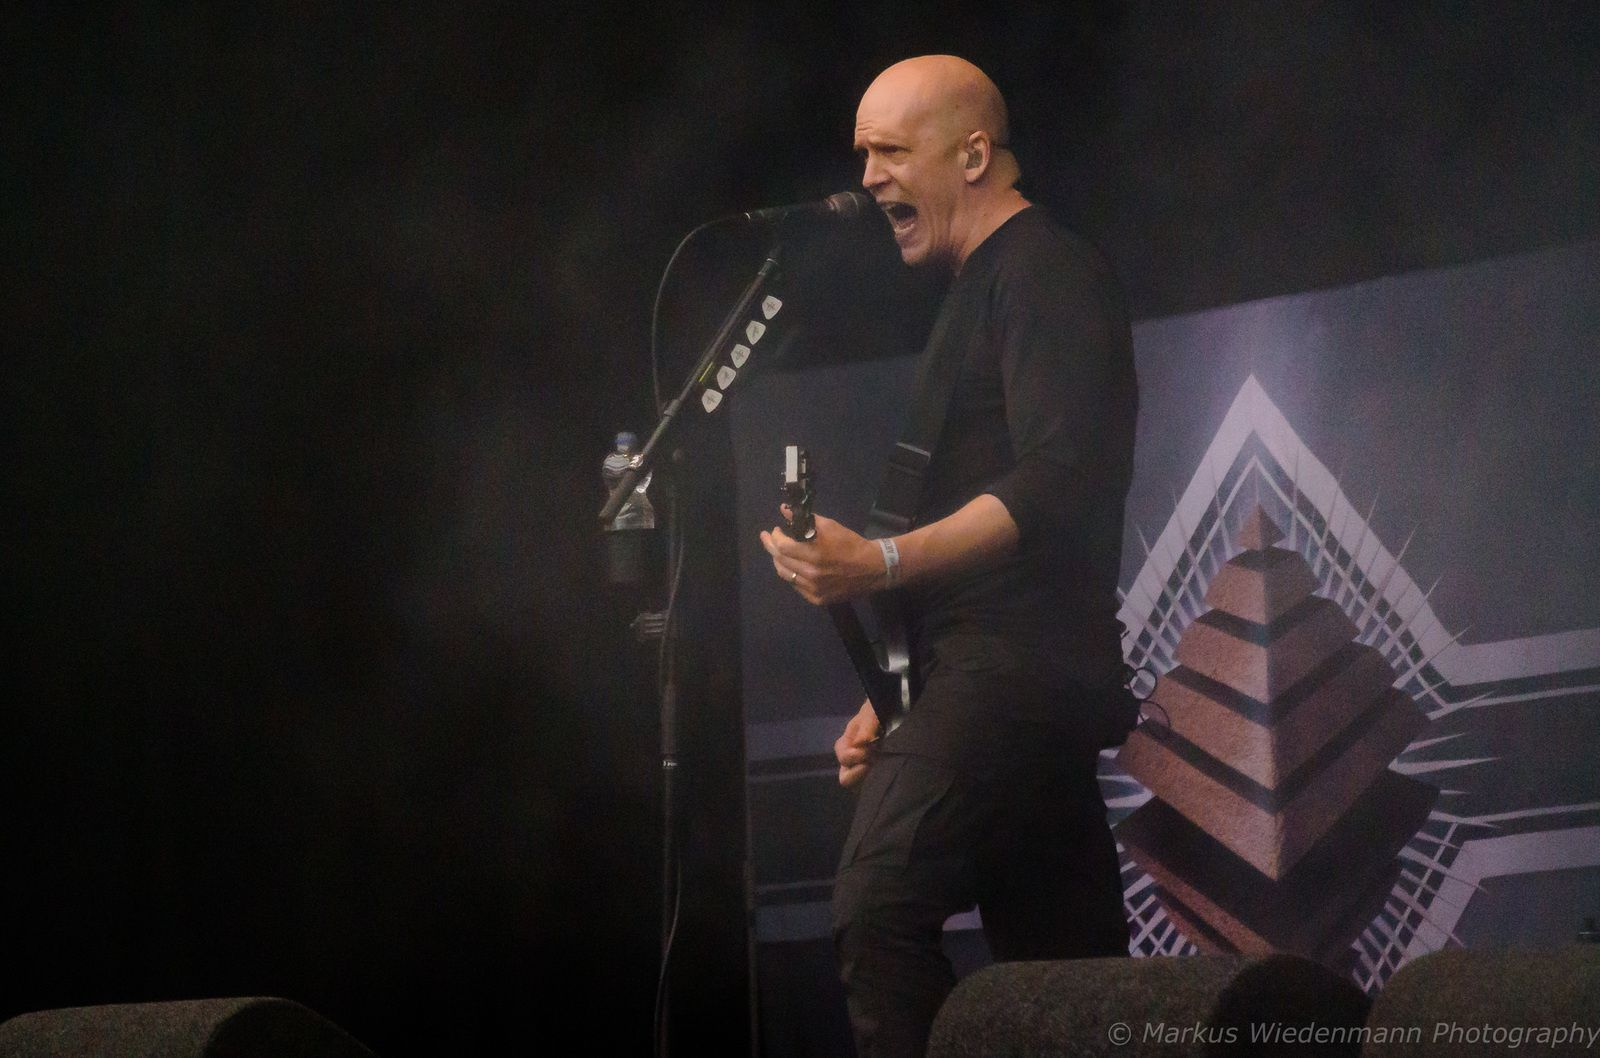 Live review DYNAMO METAL FEST 2017, 15.07.2017, Eindhoven